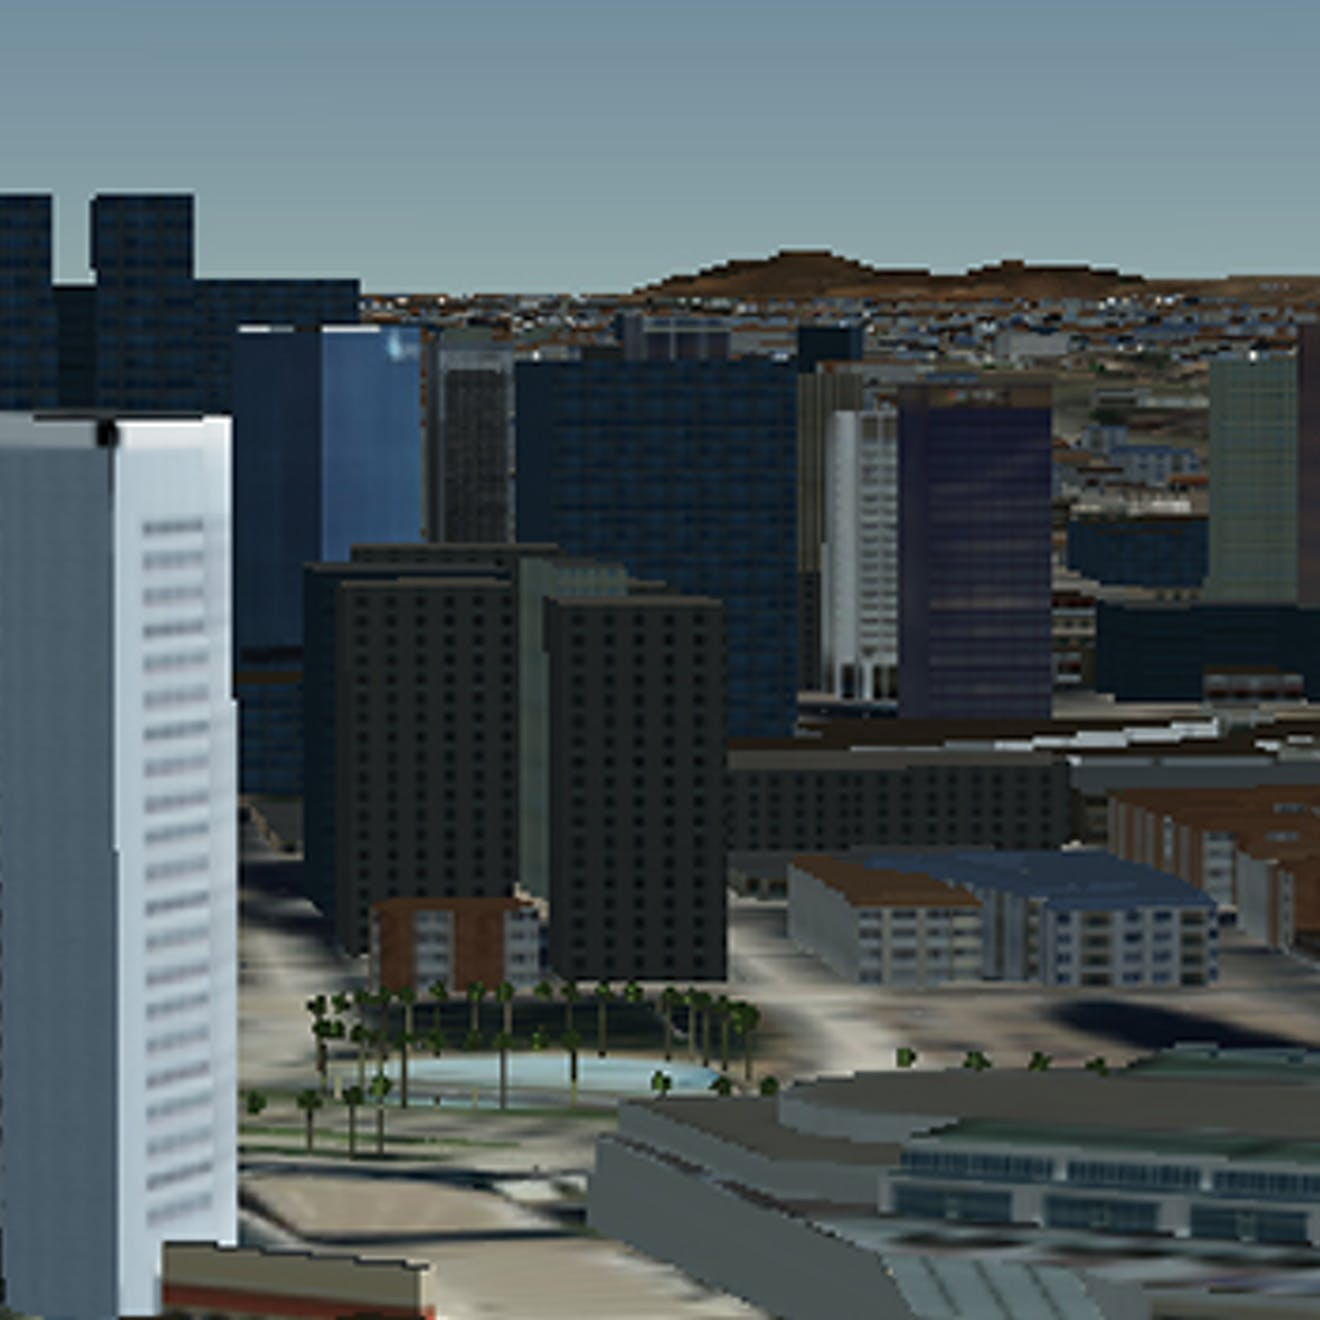 CDB data showing San Diego skyline